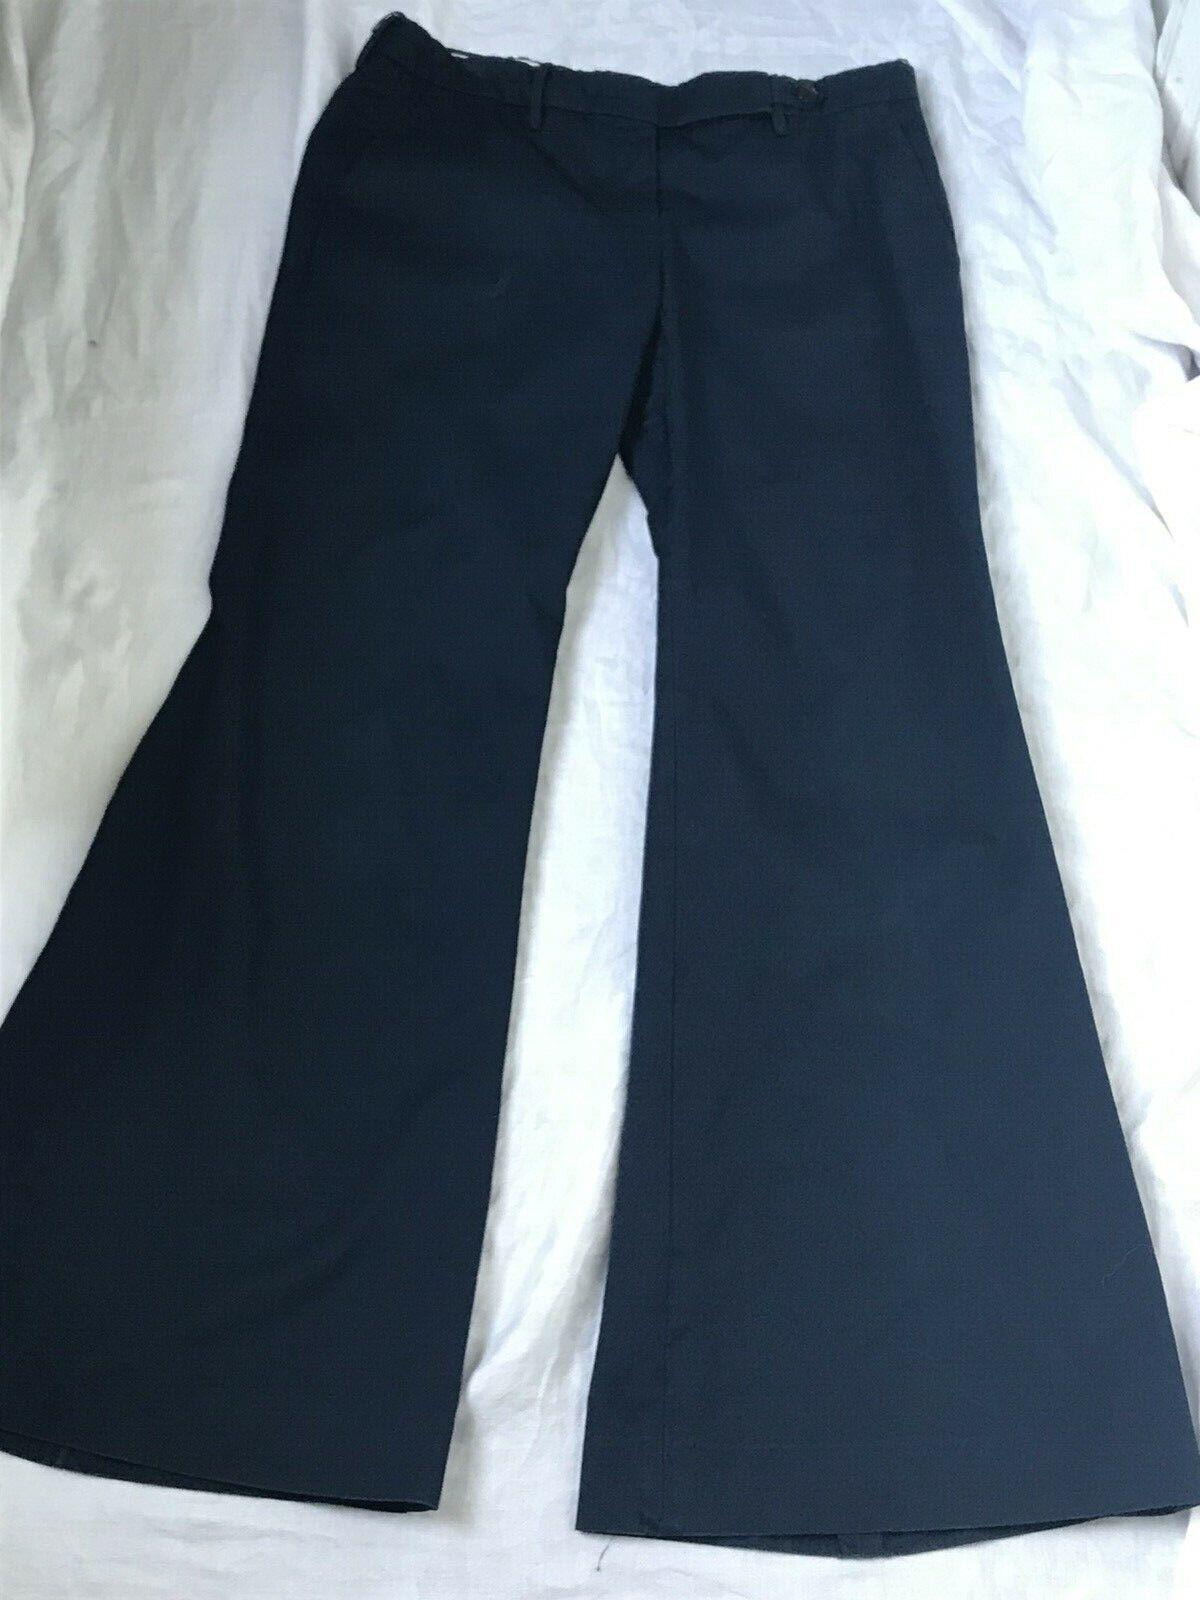 PRADA Vintage Y2K Bellbottom Flare Low Rise Pants slacks 44